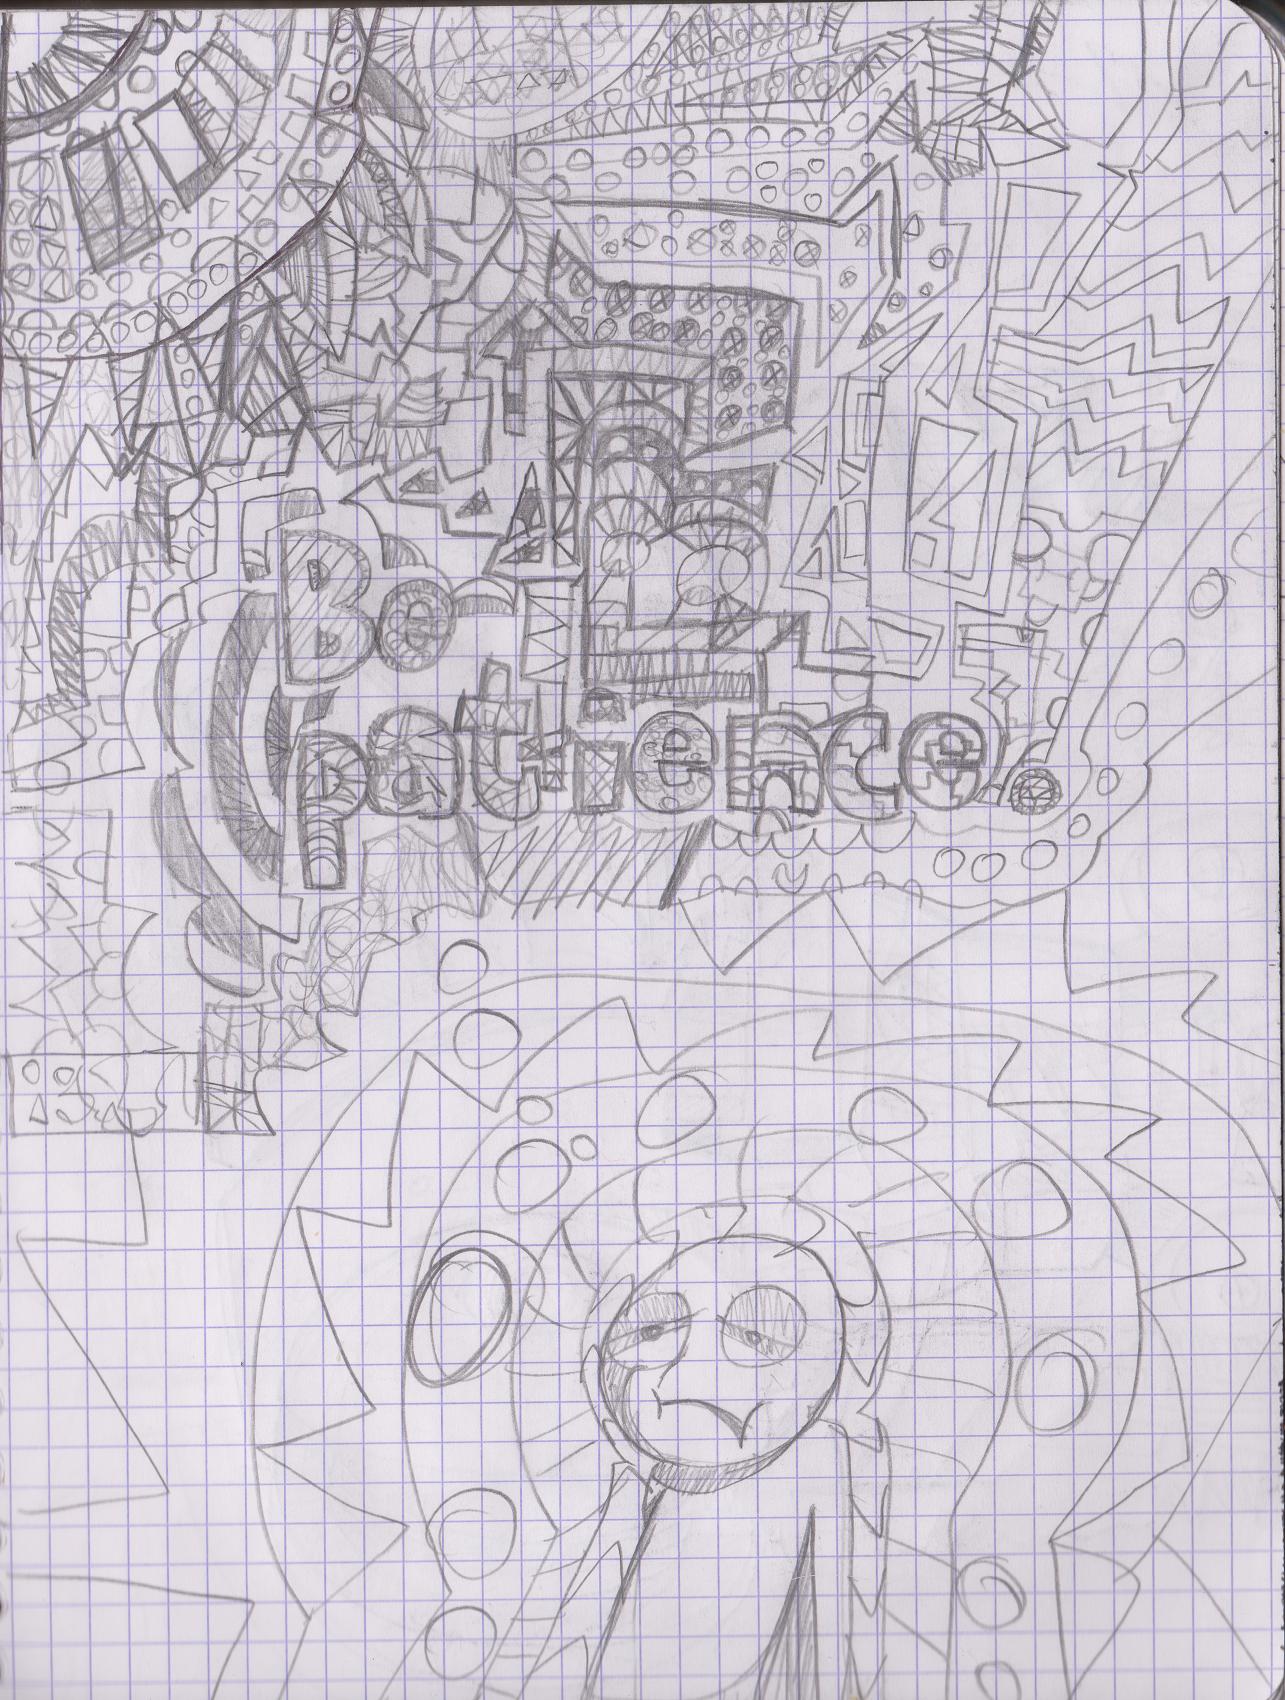 SH sketchbook page 39